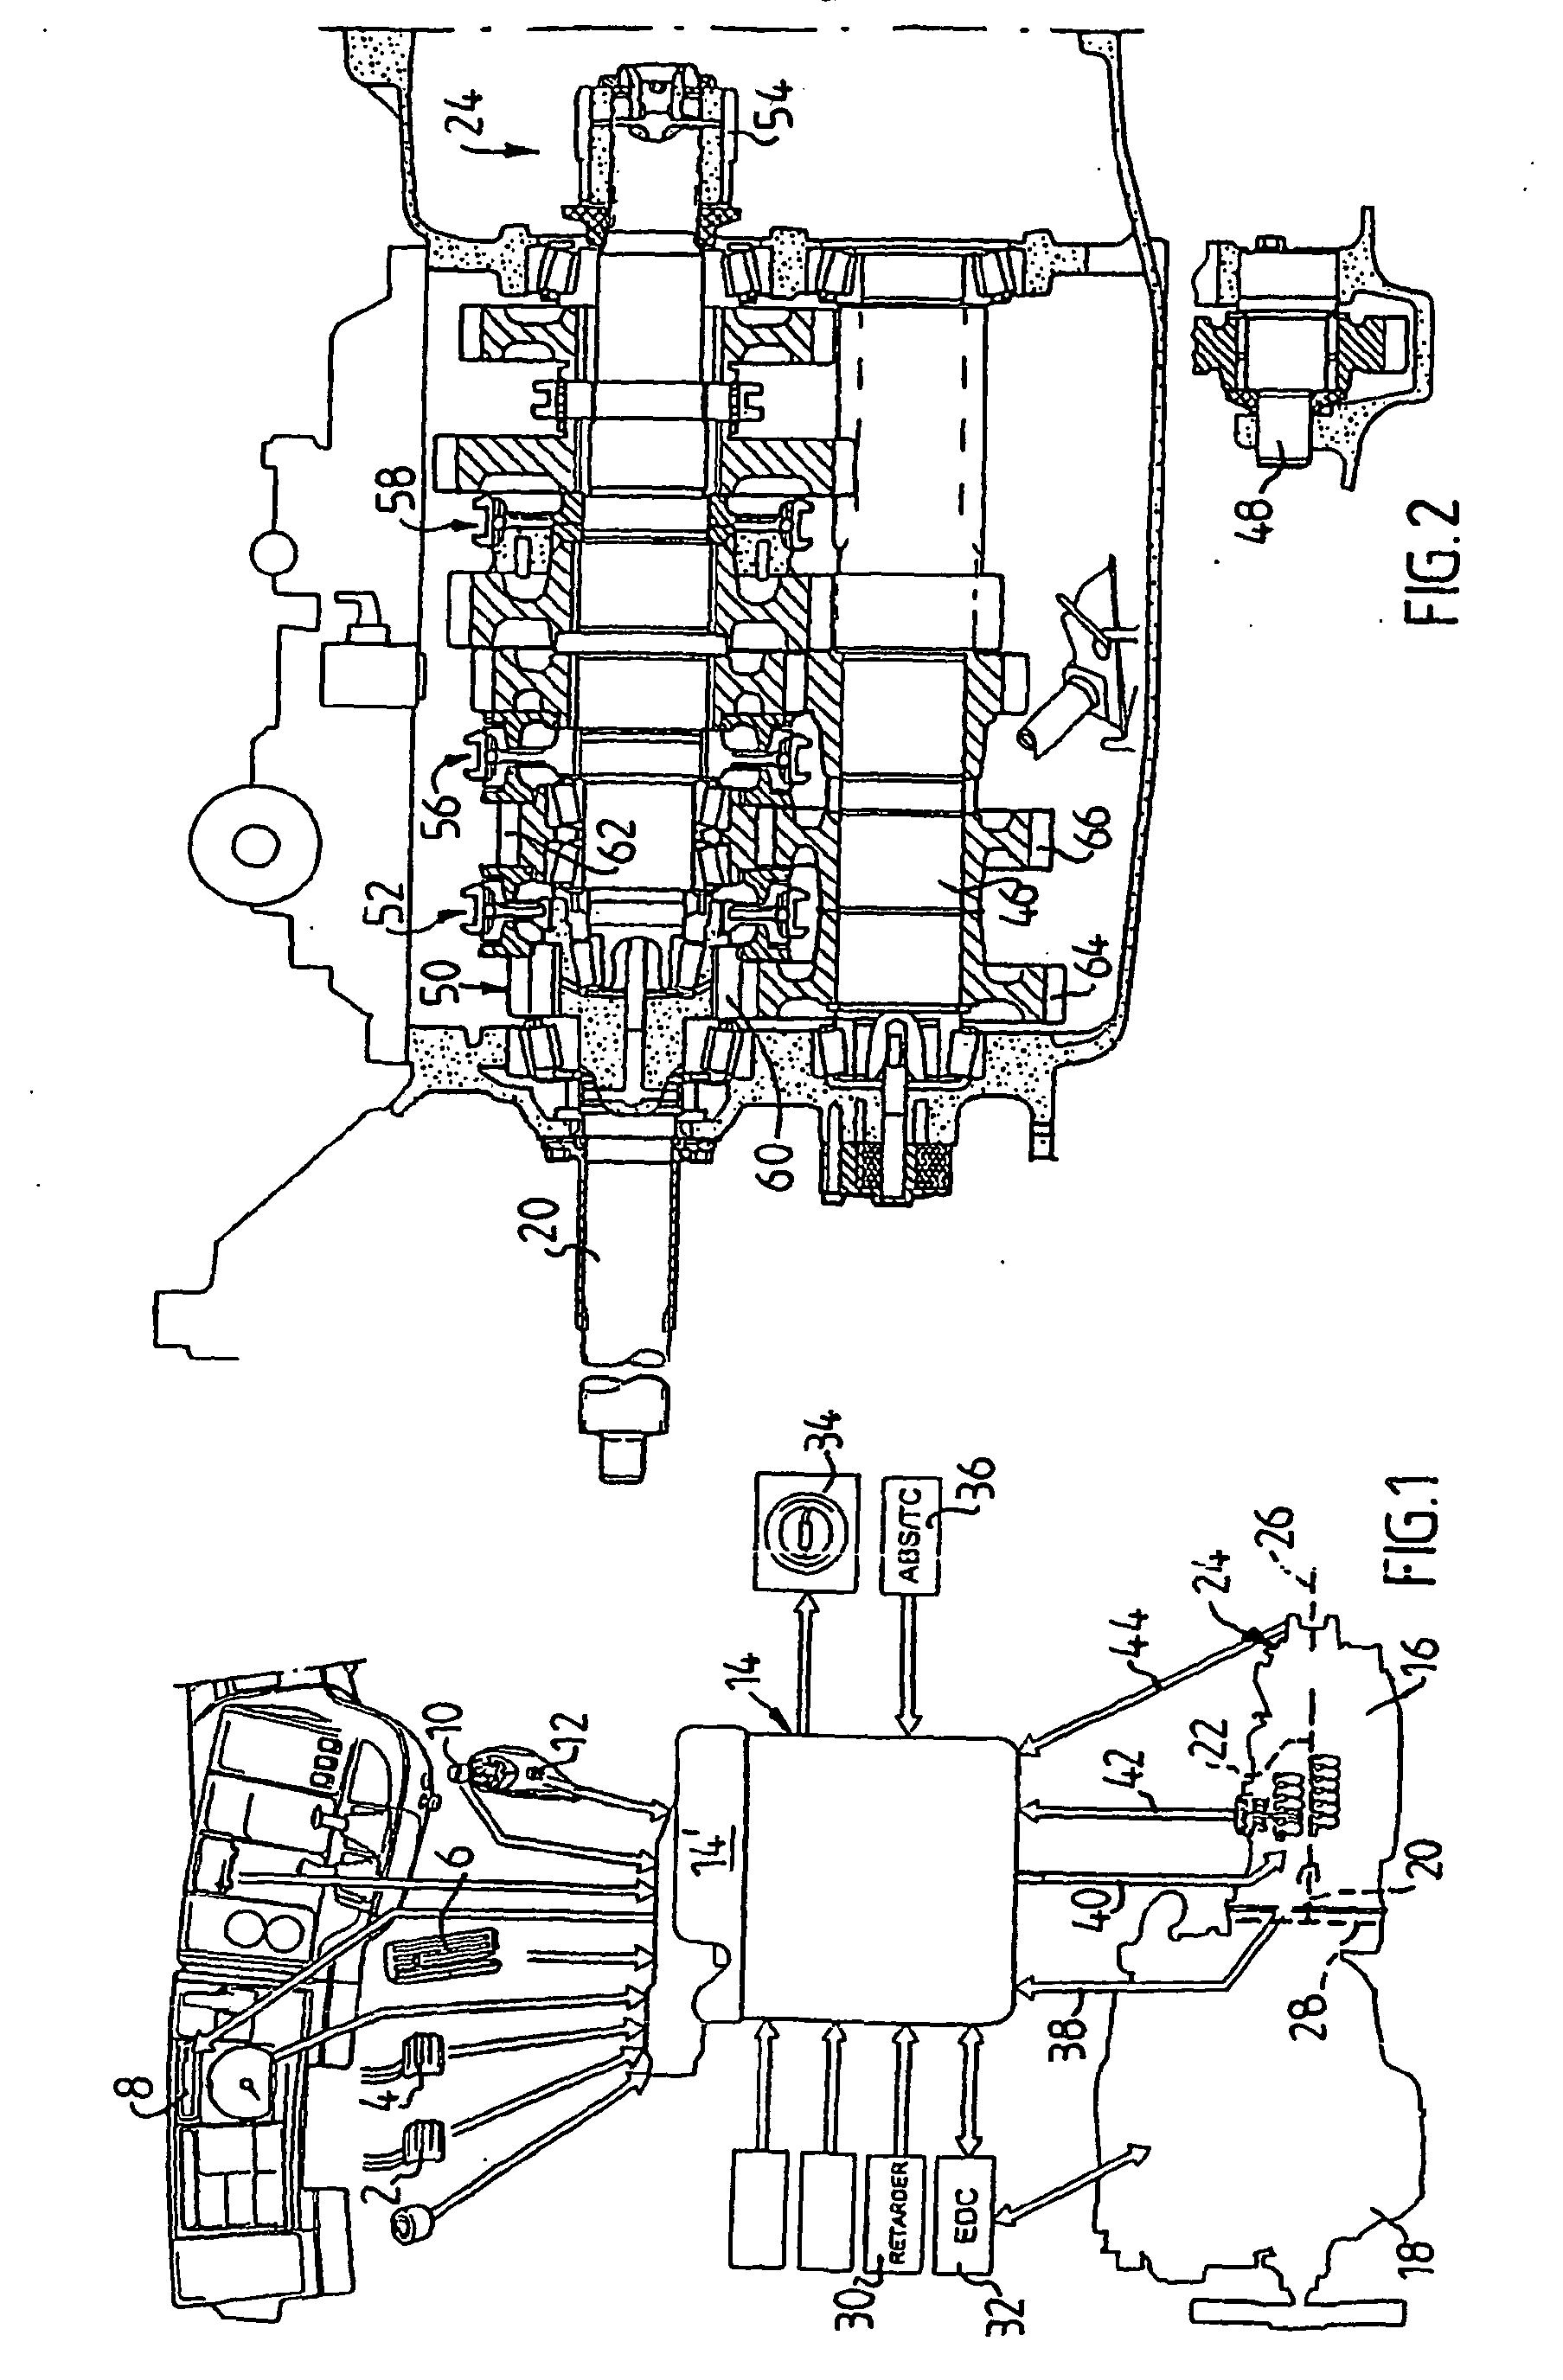 2001 Sportster 1200 Wiring Diagram Manual Of Fuse 03 Engine Imageresizertool Com Harley